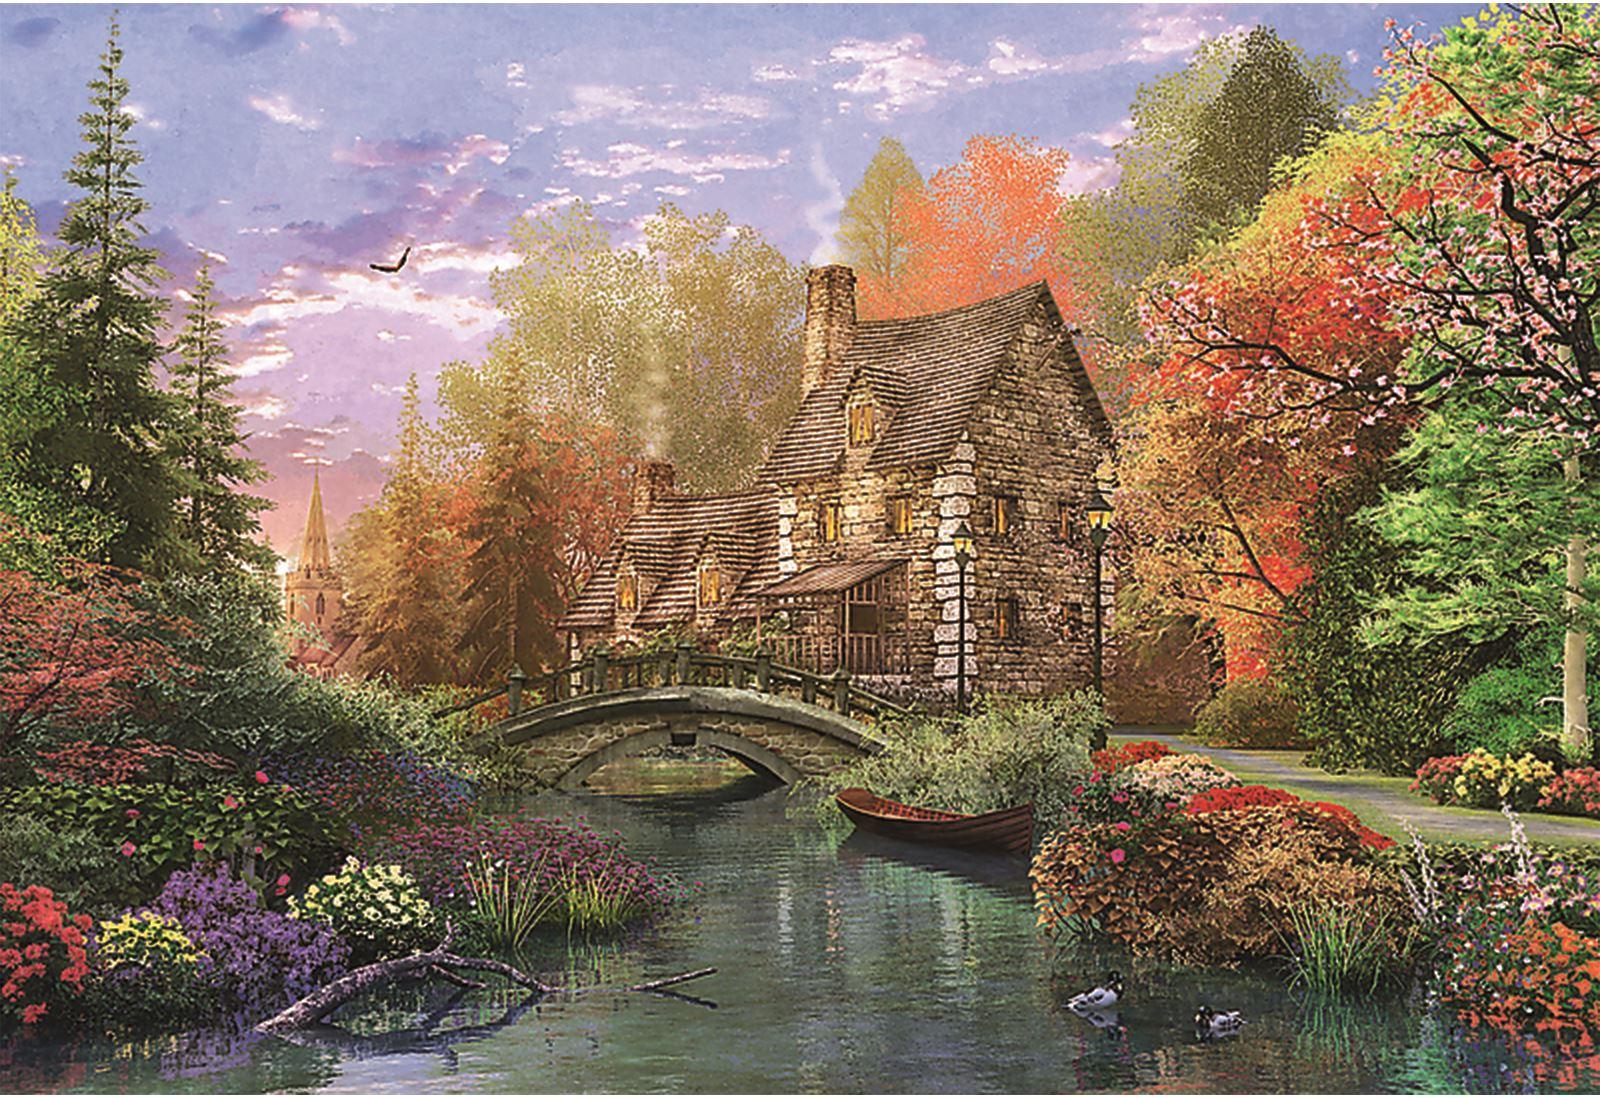 Trefl-300-500-1000-1500-2000-3000-4000-6000-Piece-Jigsaw-Puzzle-Landscapes-City thumbnail 91